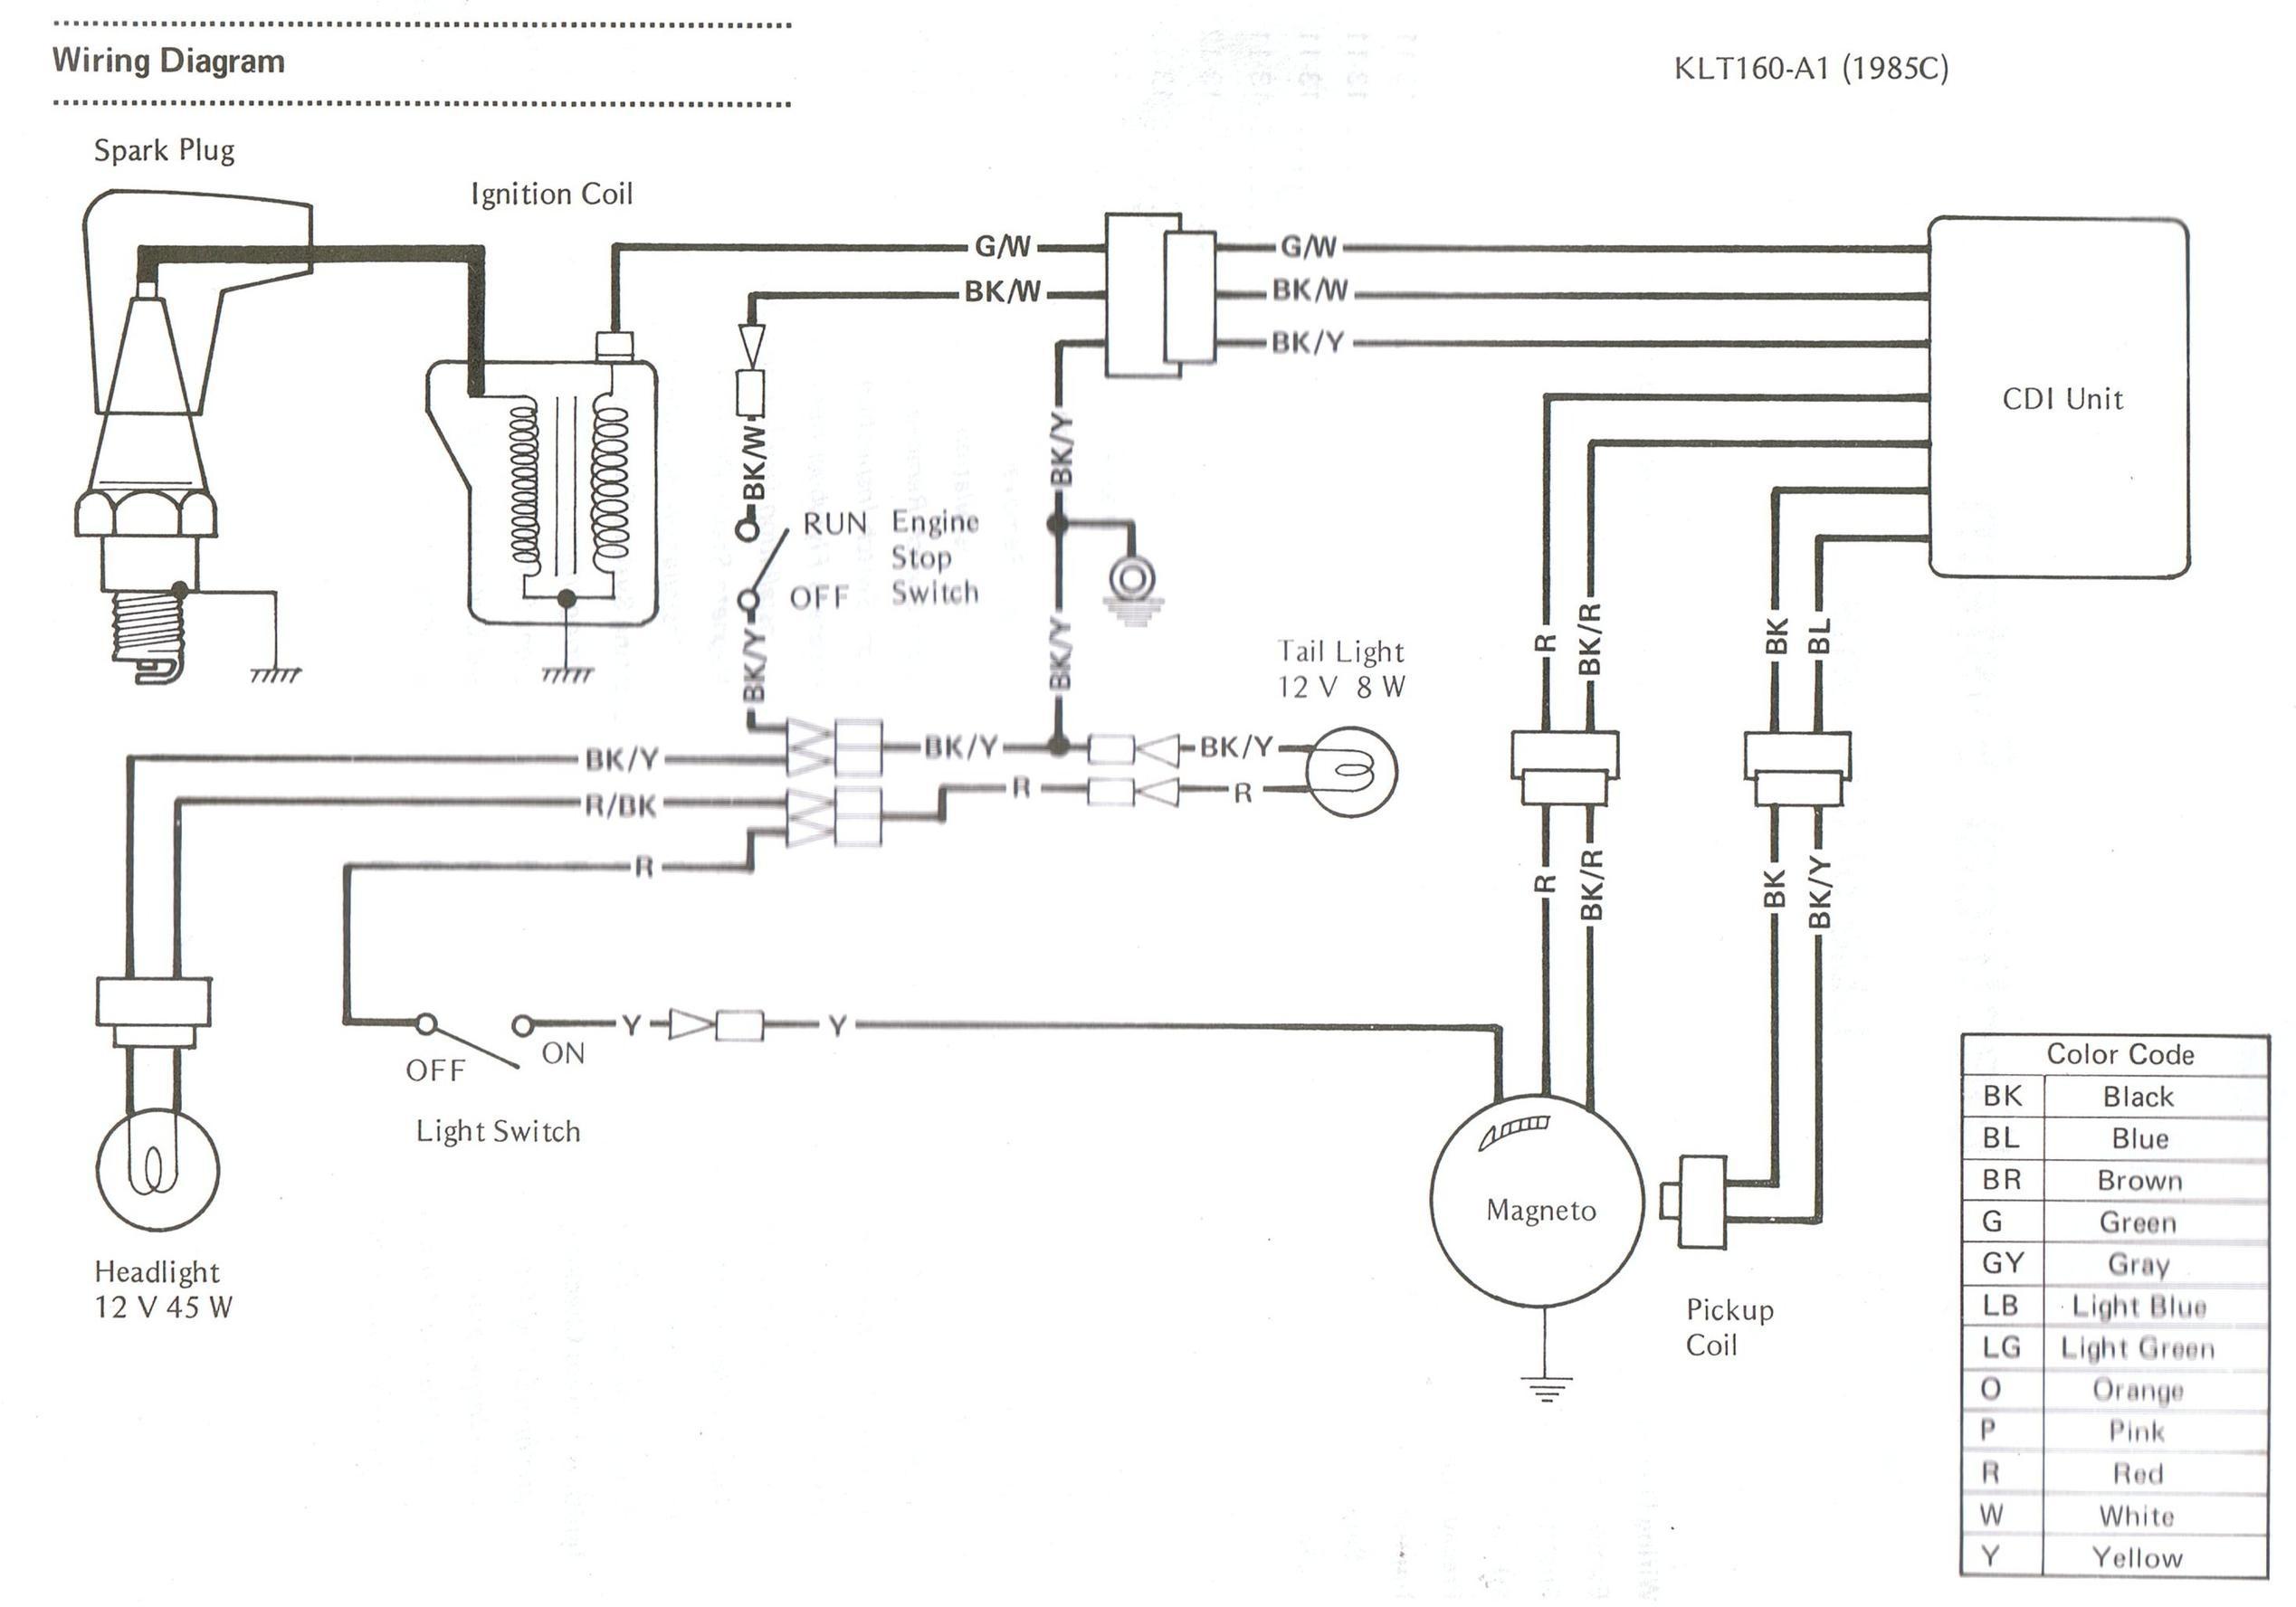 1989 rinker wiring diagram basic wiring diagram u2022 rh rnetcomputer co Simple Boat Wiring Diagram Boat Ignition Switch Wiring Diagram